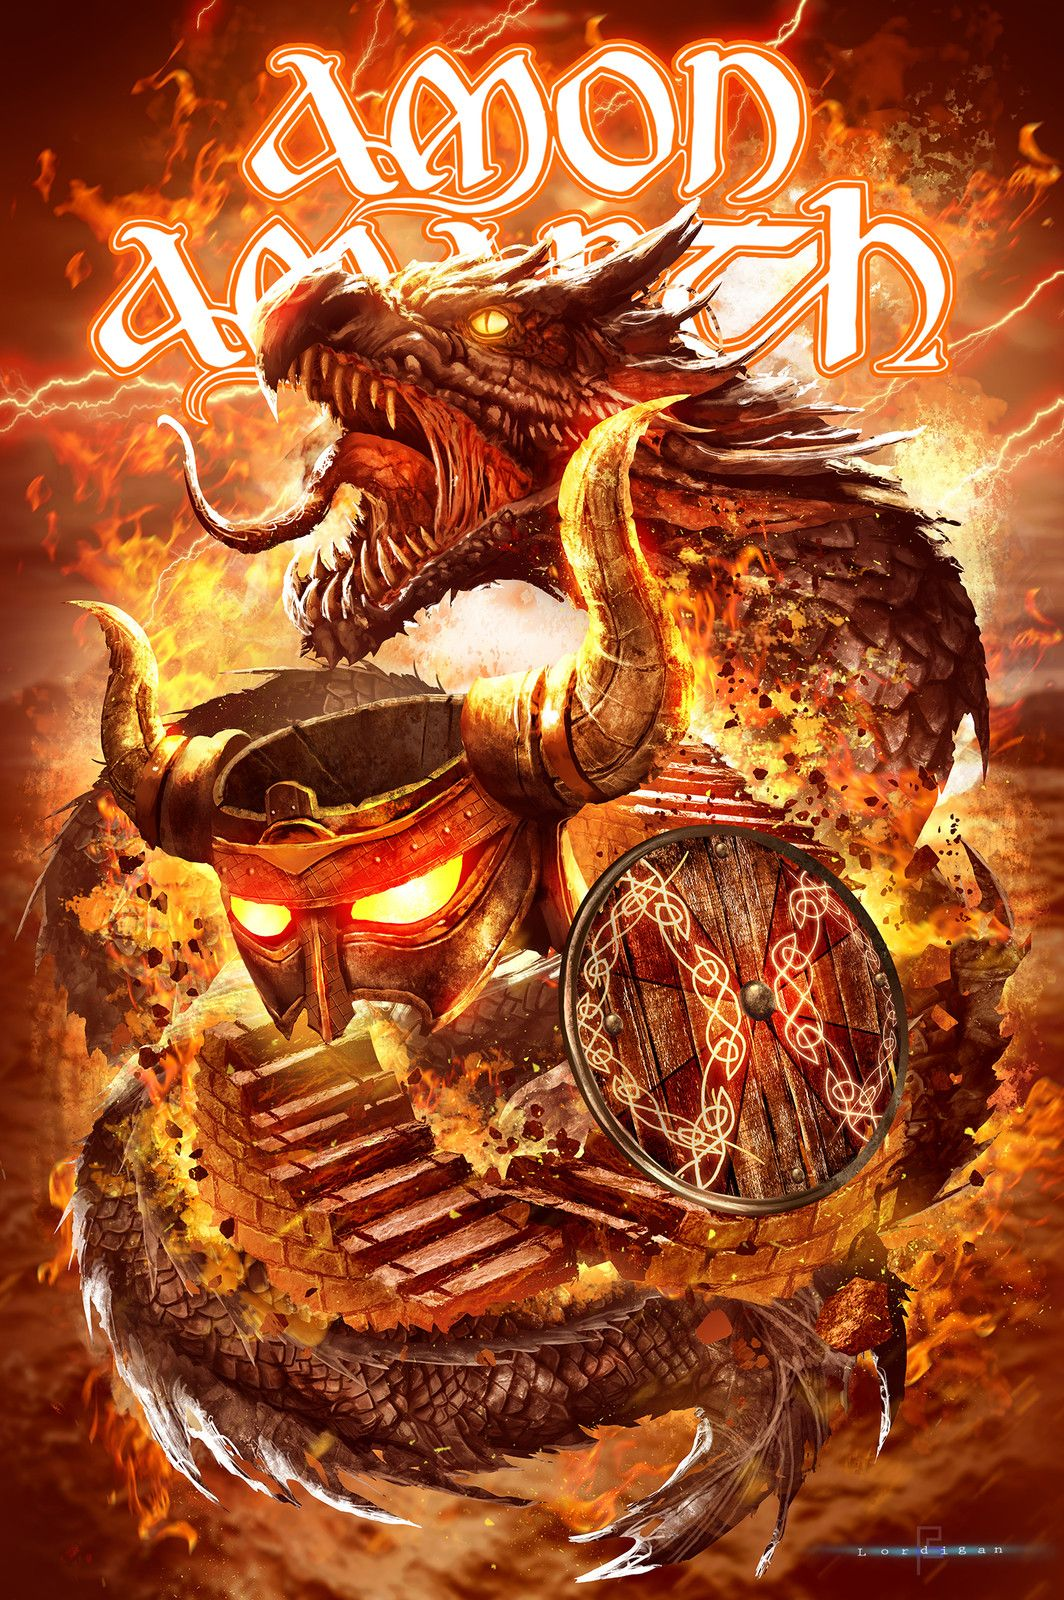 Pin By Kyle Mccoy On Tattoo Designs Amon Amarth Amon Heavy